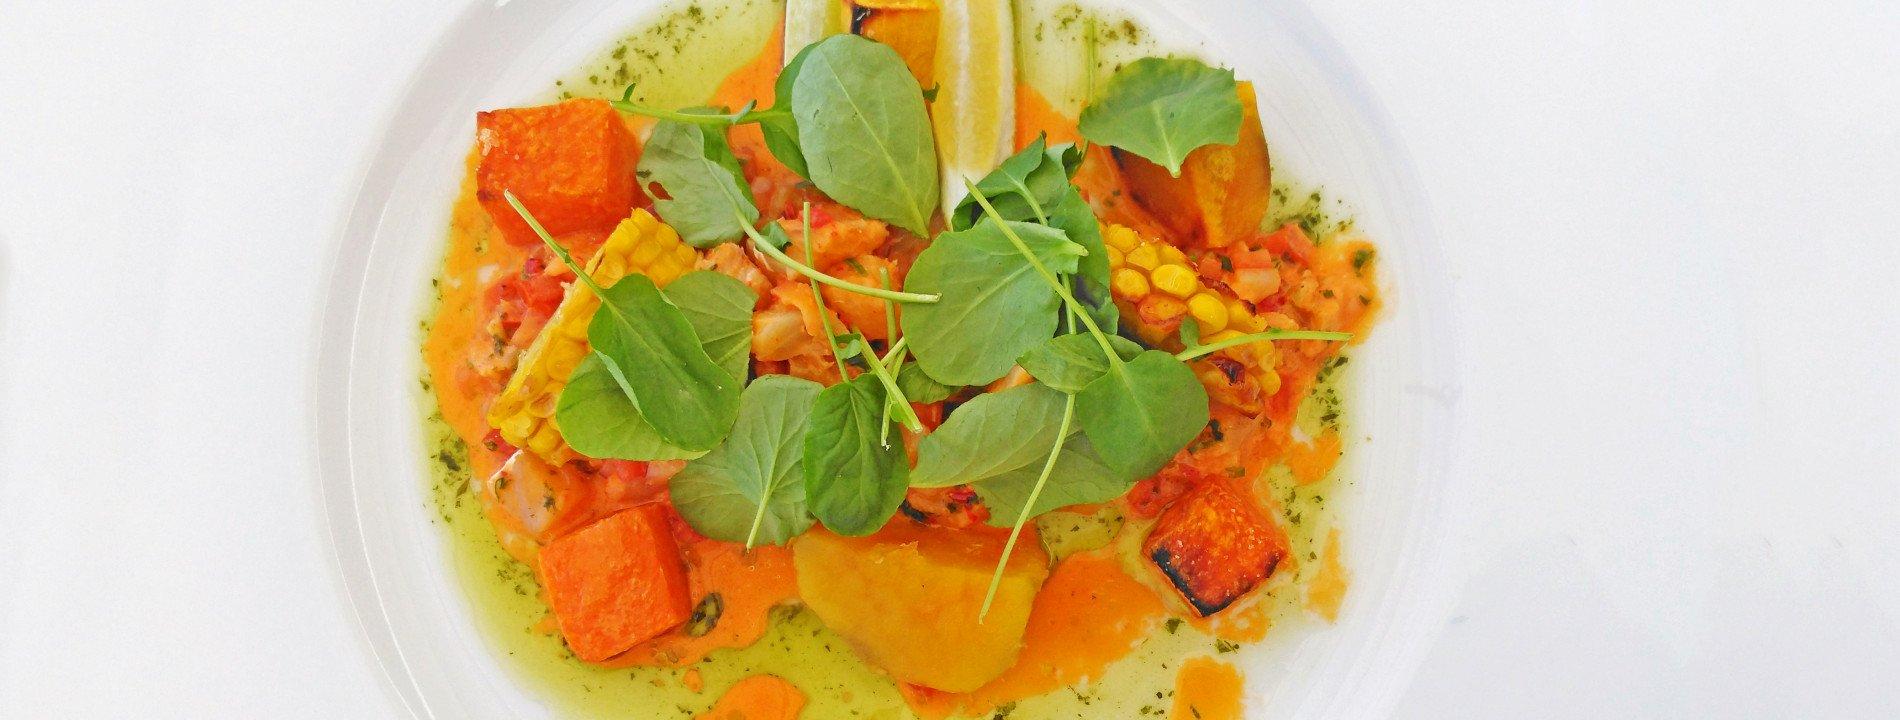 Autumn Salad with Cod